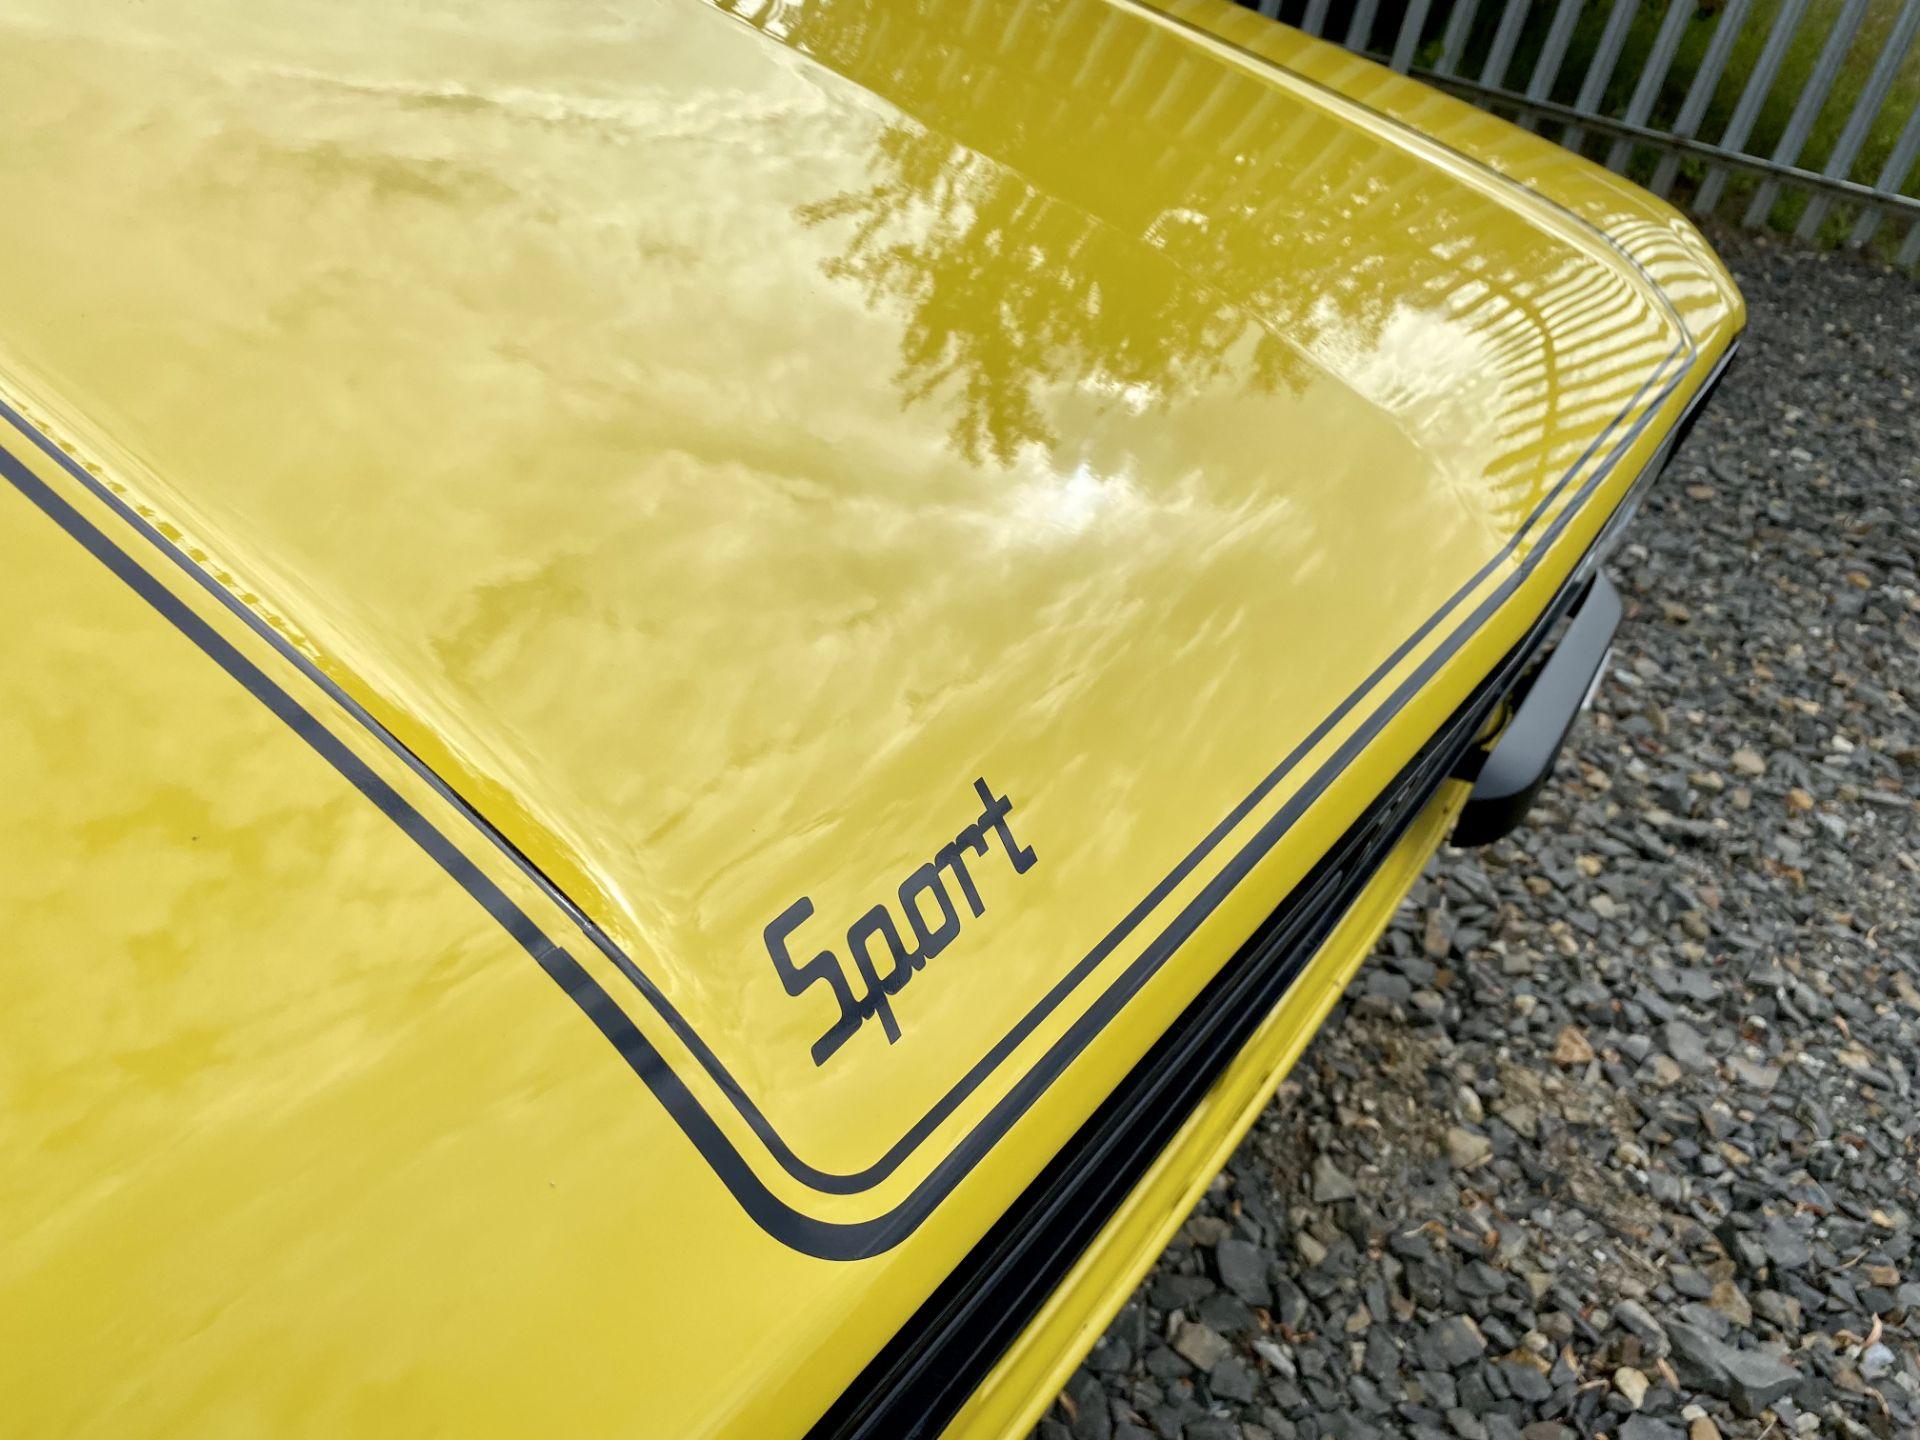 Ford Escort MK2 - Image 31 of 58